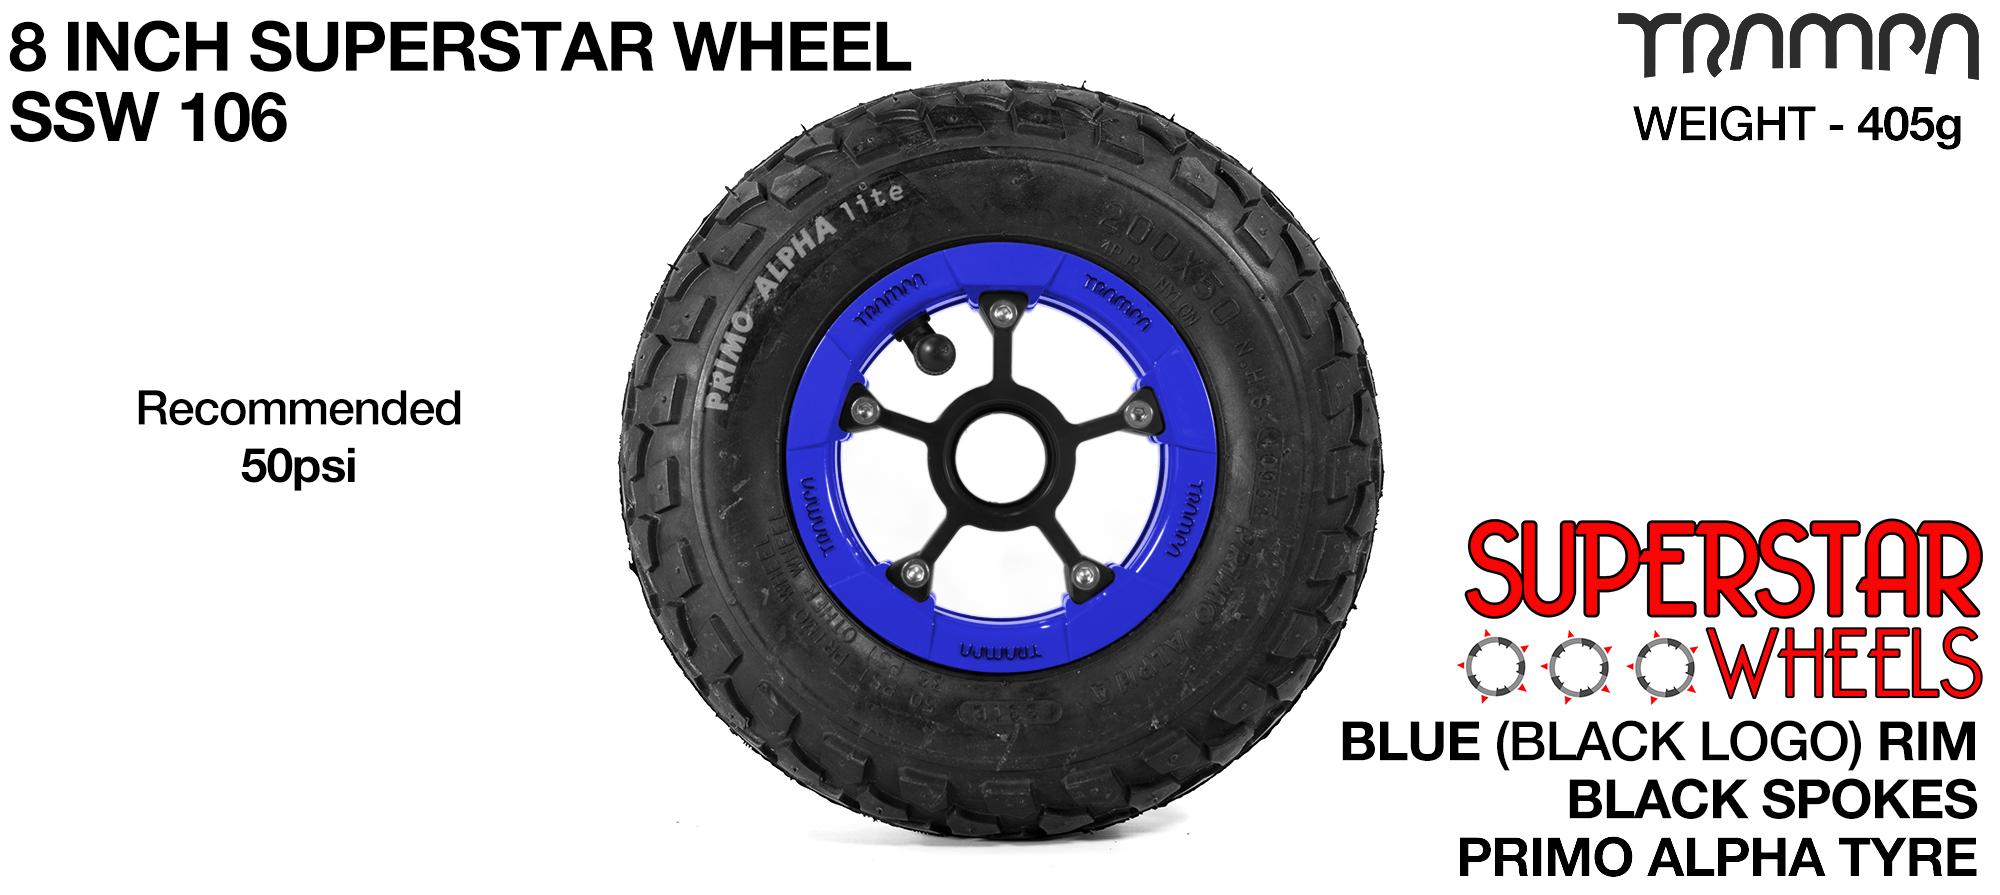 Superstar 8 inch wheels -  Blue Gloss & Black Logo Rim Black Anodised Spokes & Black Alpha 8 inch Tyre